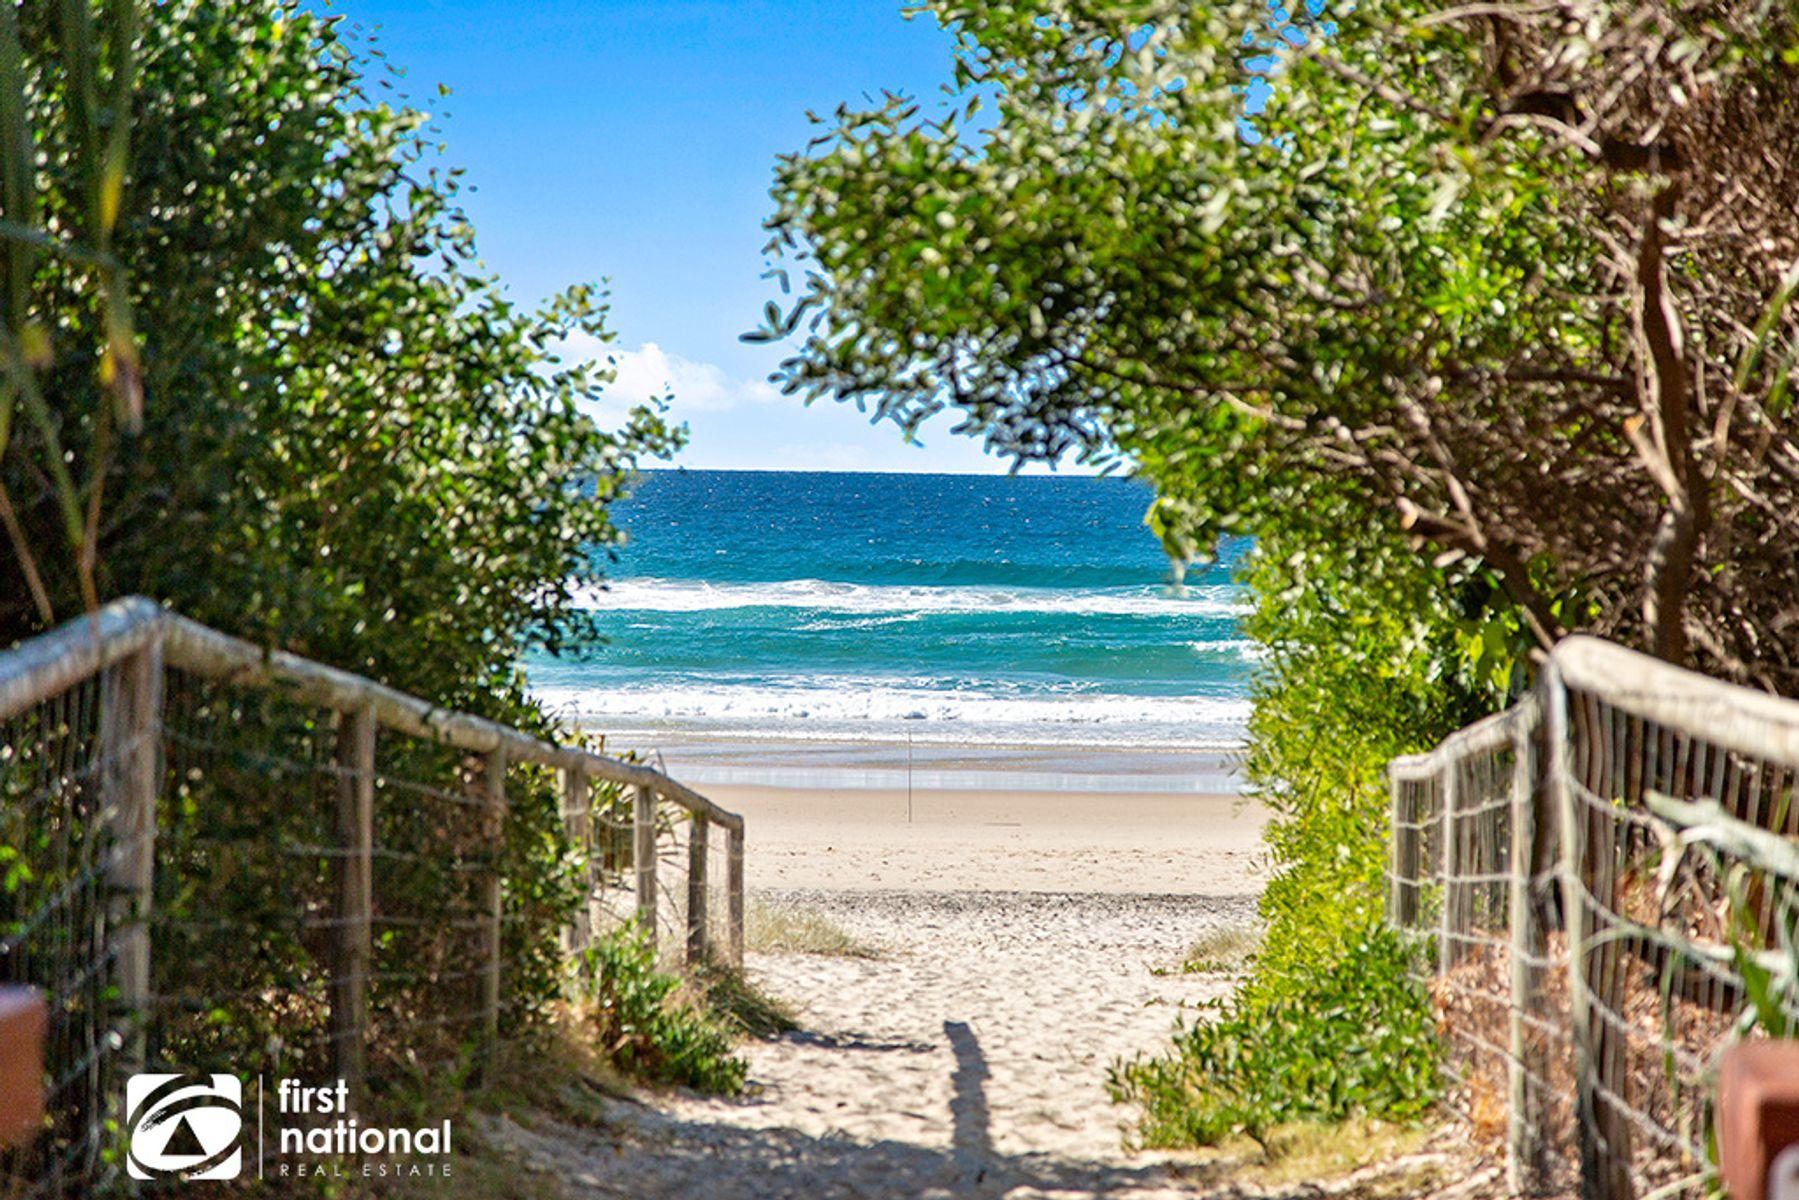 3/7 Aubrey Street, Surfers Paradise, QLD 4217